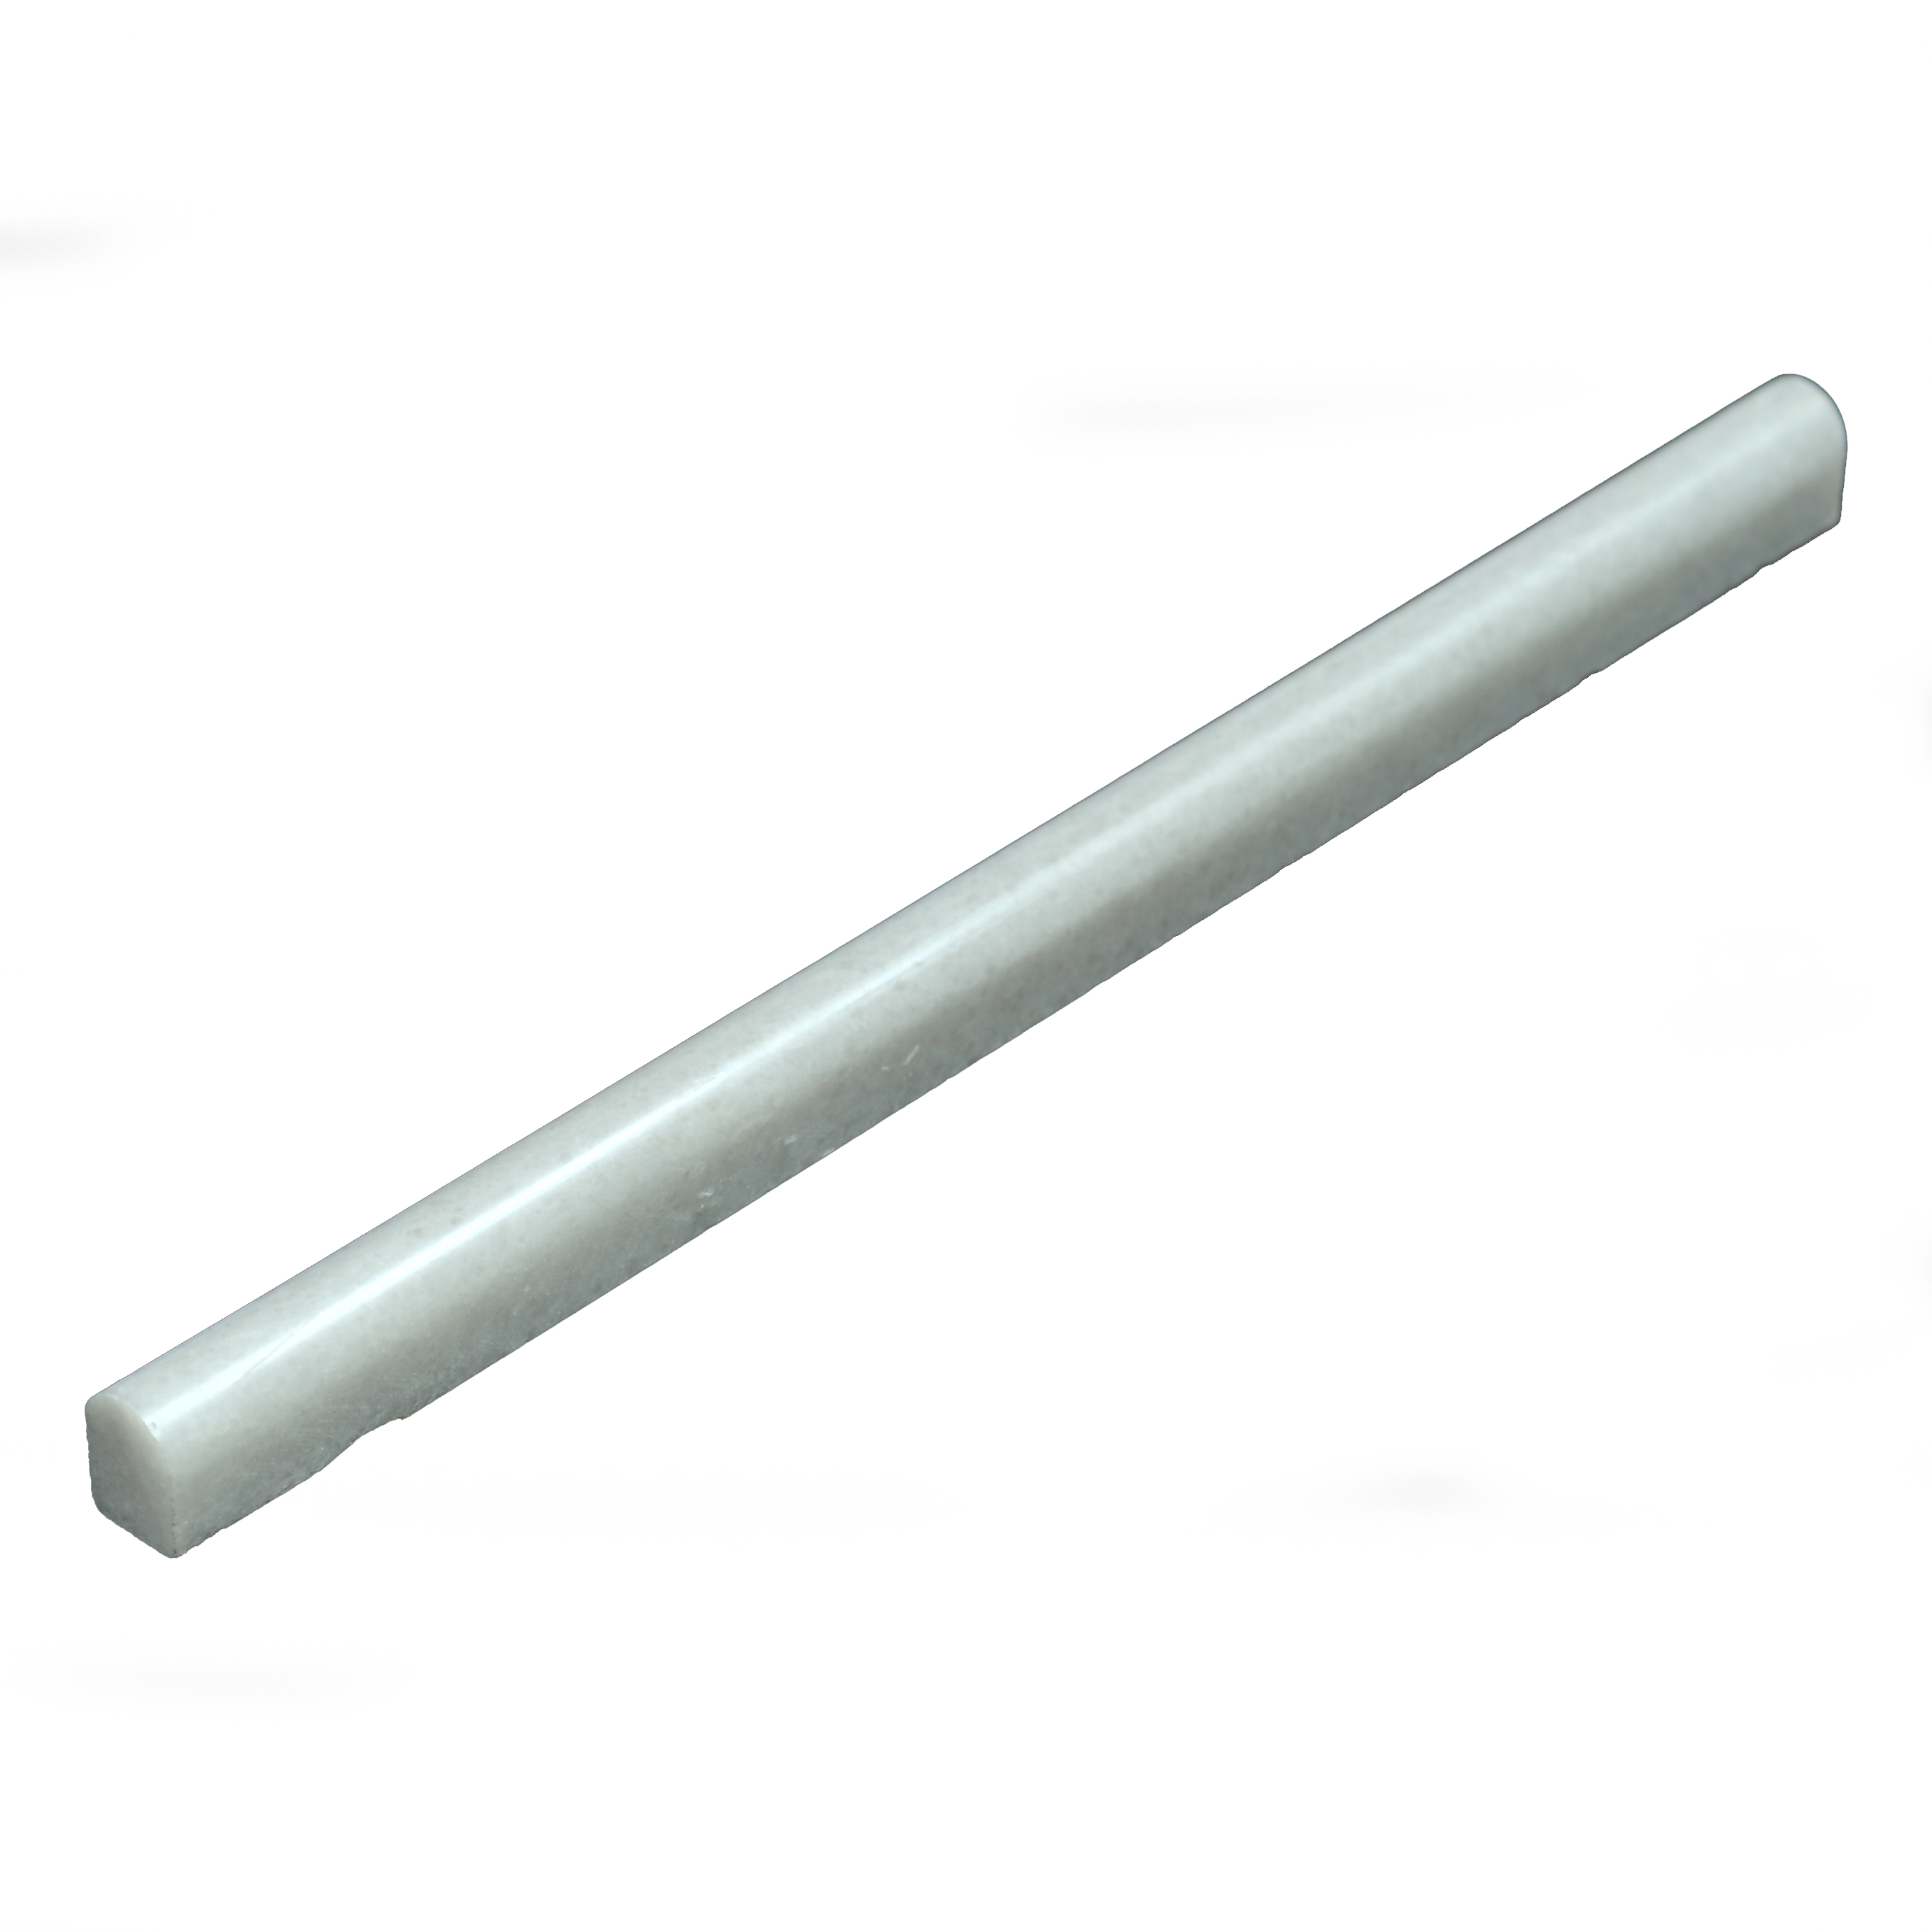 Equator Pencil - 1/2x12 Image